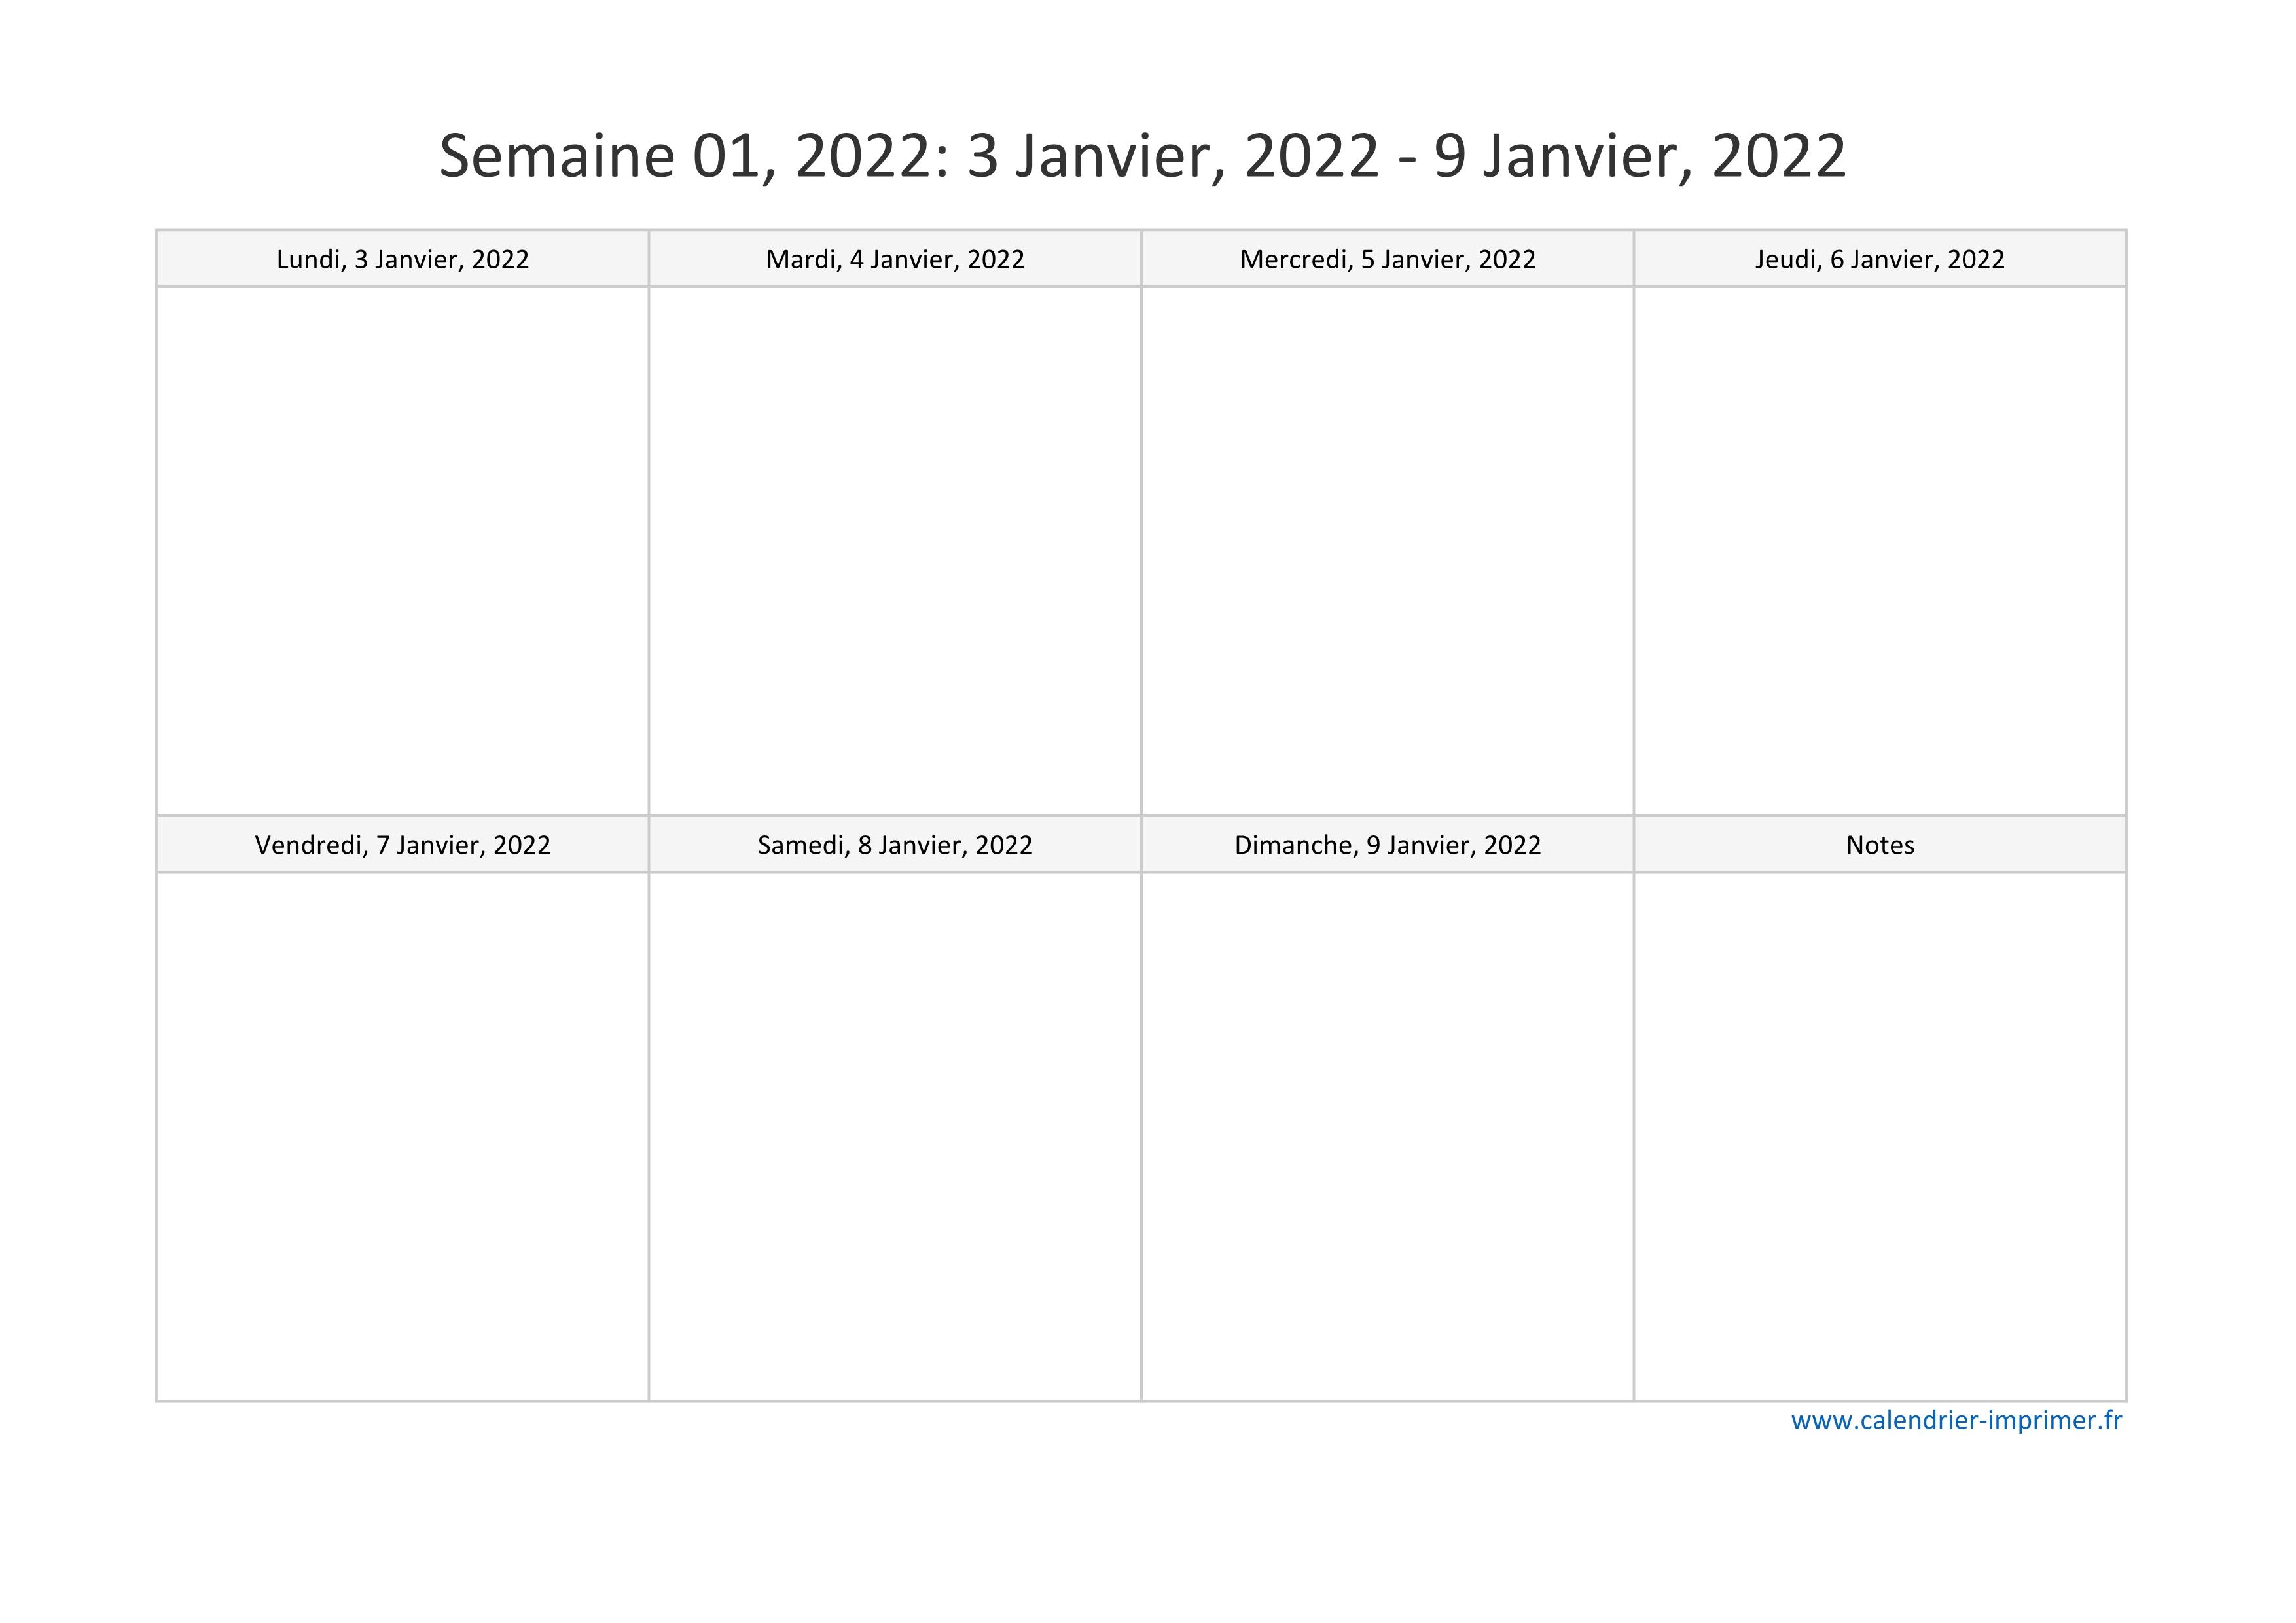 Calendrier Semainier 2022 à Imprimer Calendrier 2022 semaine (planning, hebdomadaire, semainier)